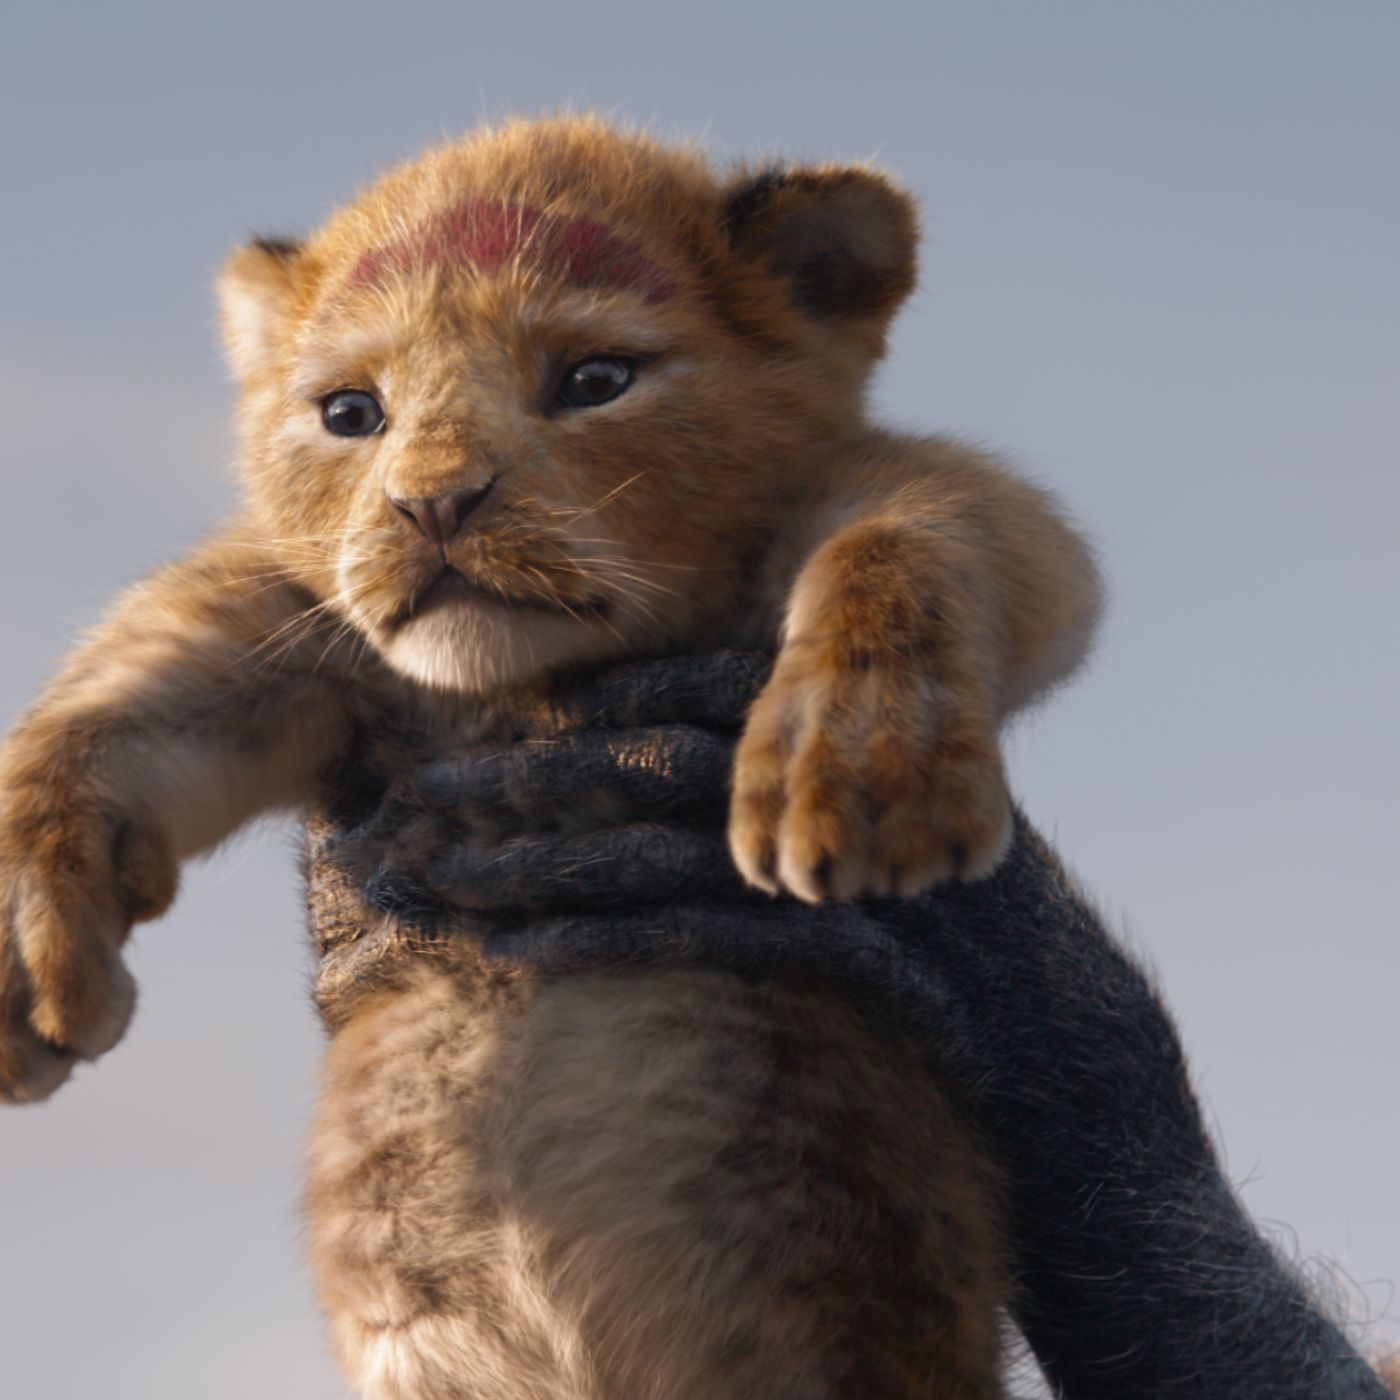 Simba in the Lion King Disney movie.